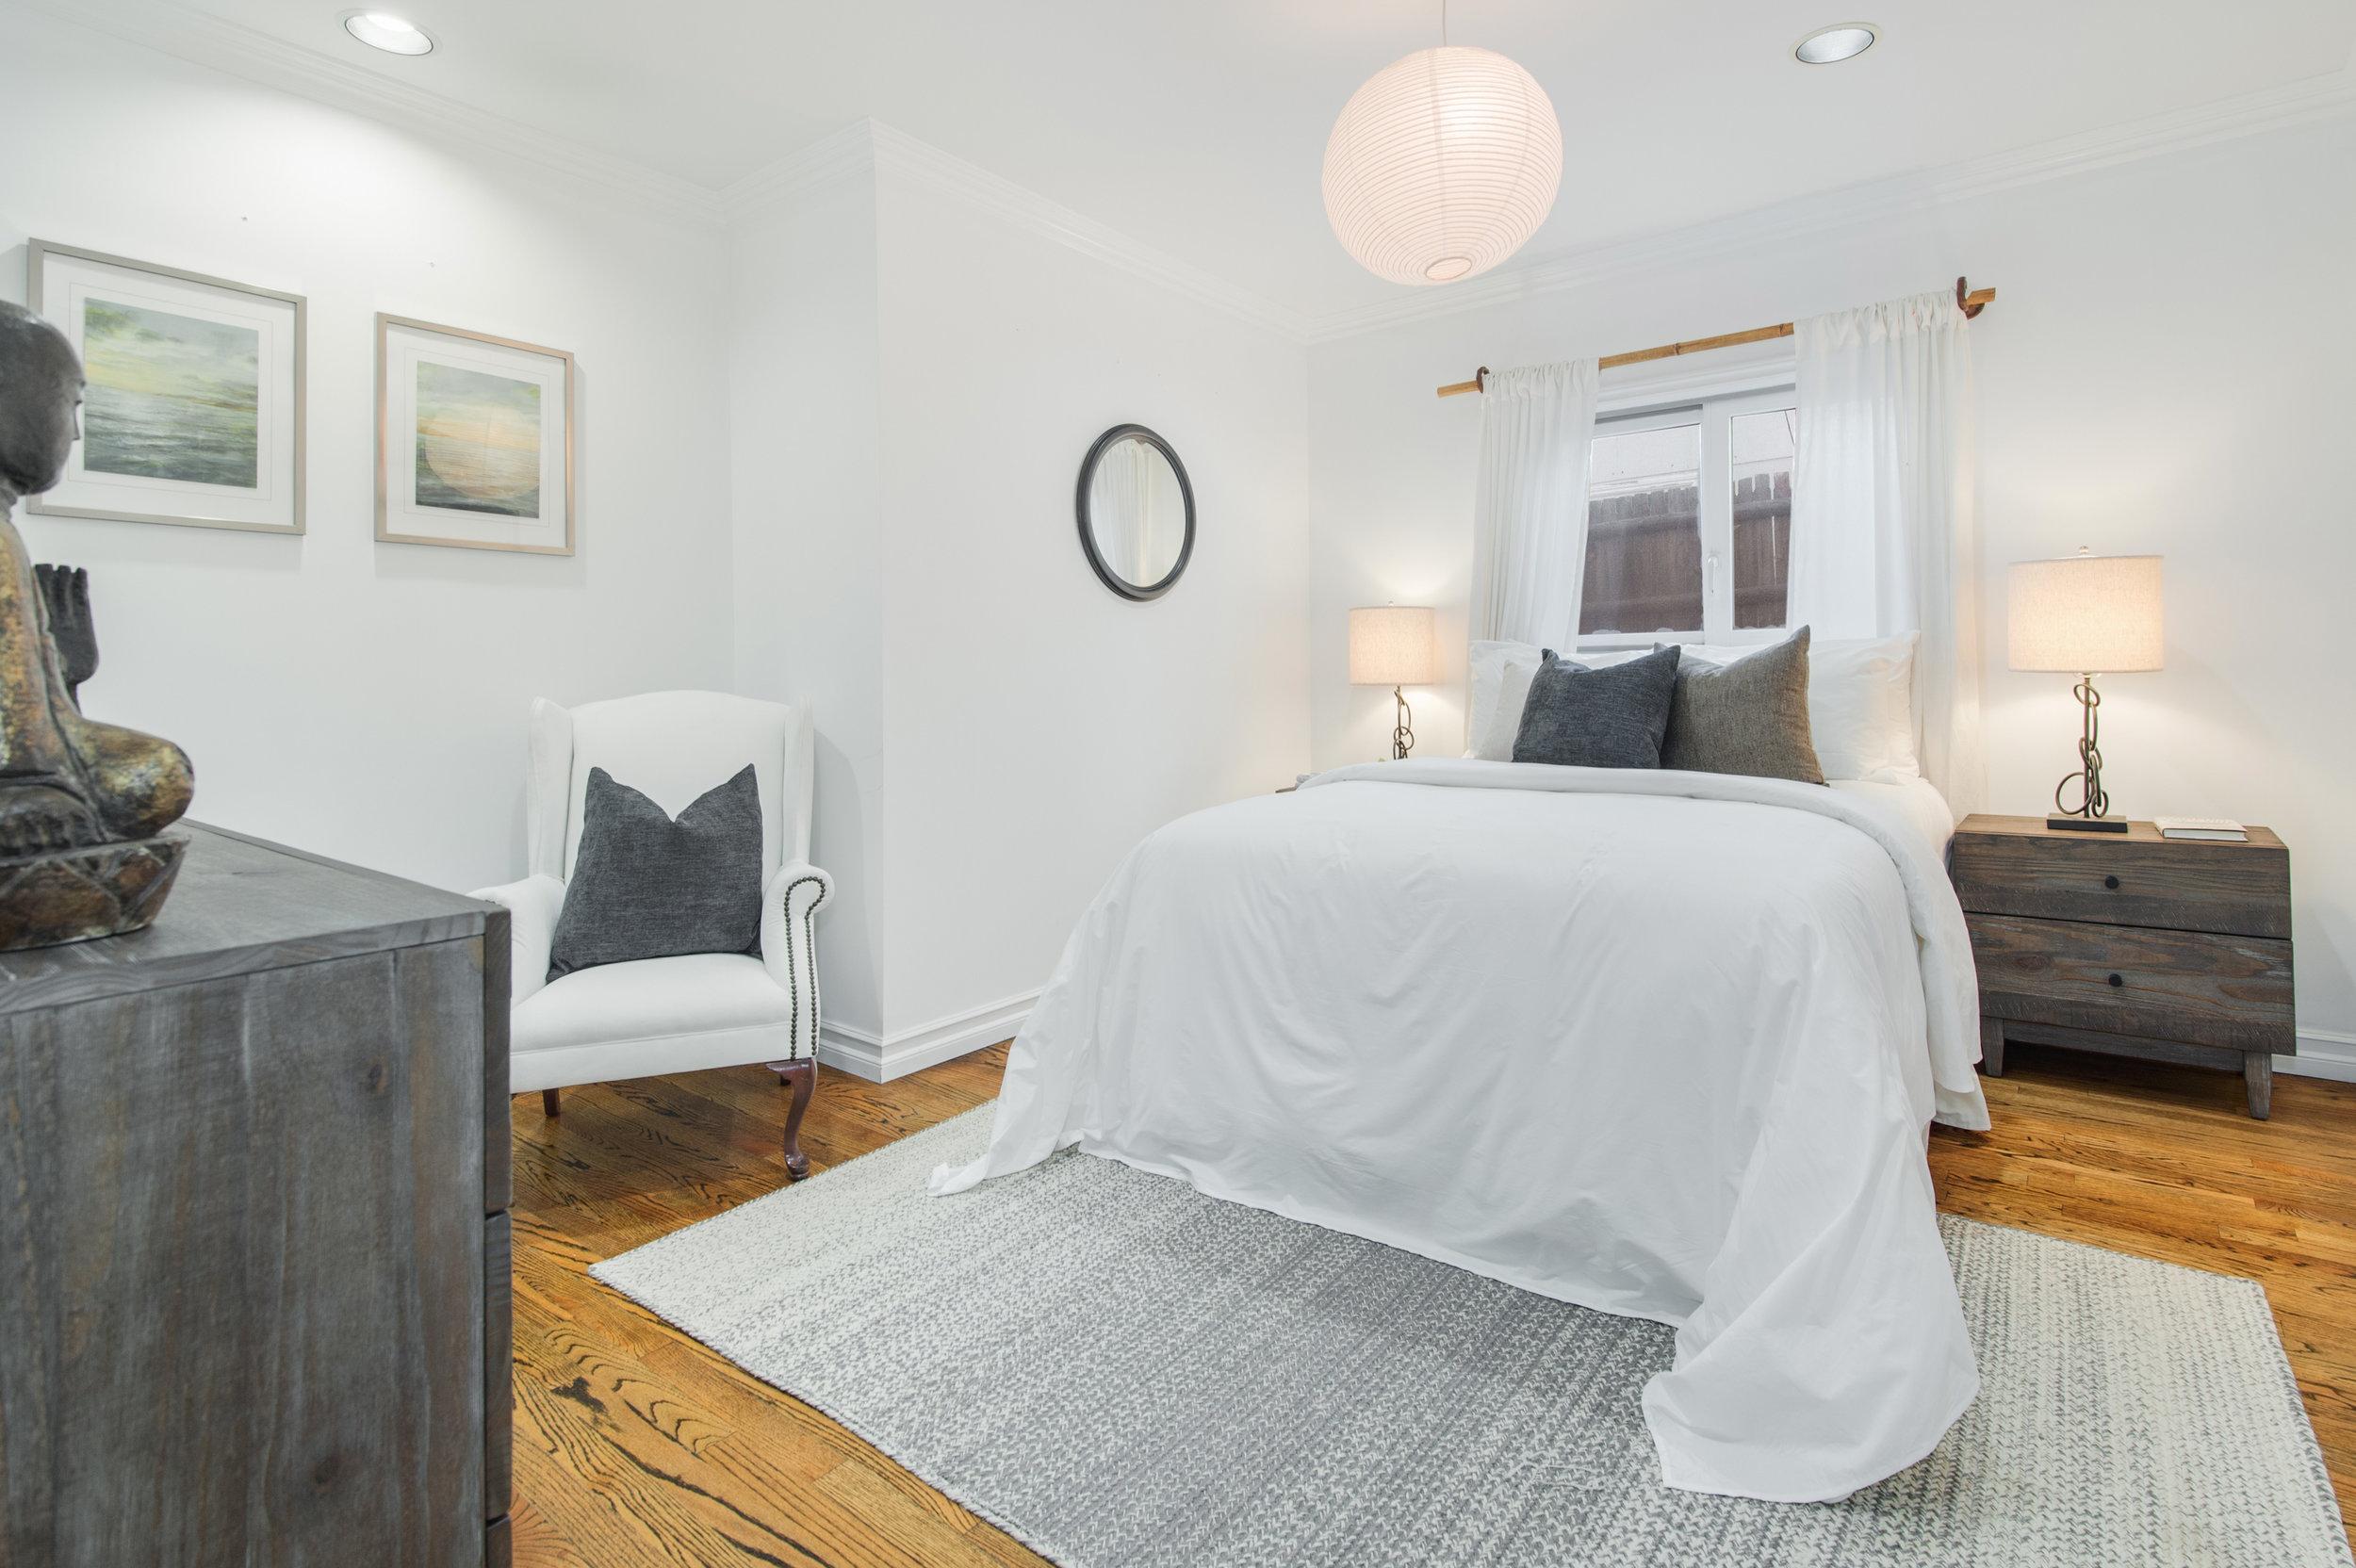 022 Bedroom 25342 Malibu Road For Sale Lease The Malibu Life Team Luxury Real Estate.jpg